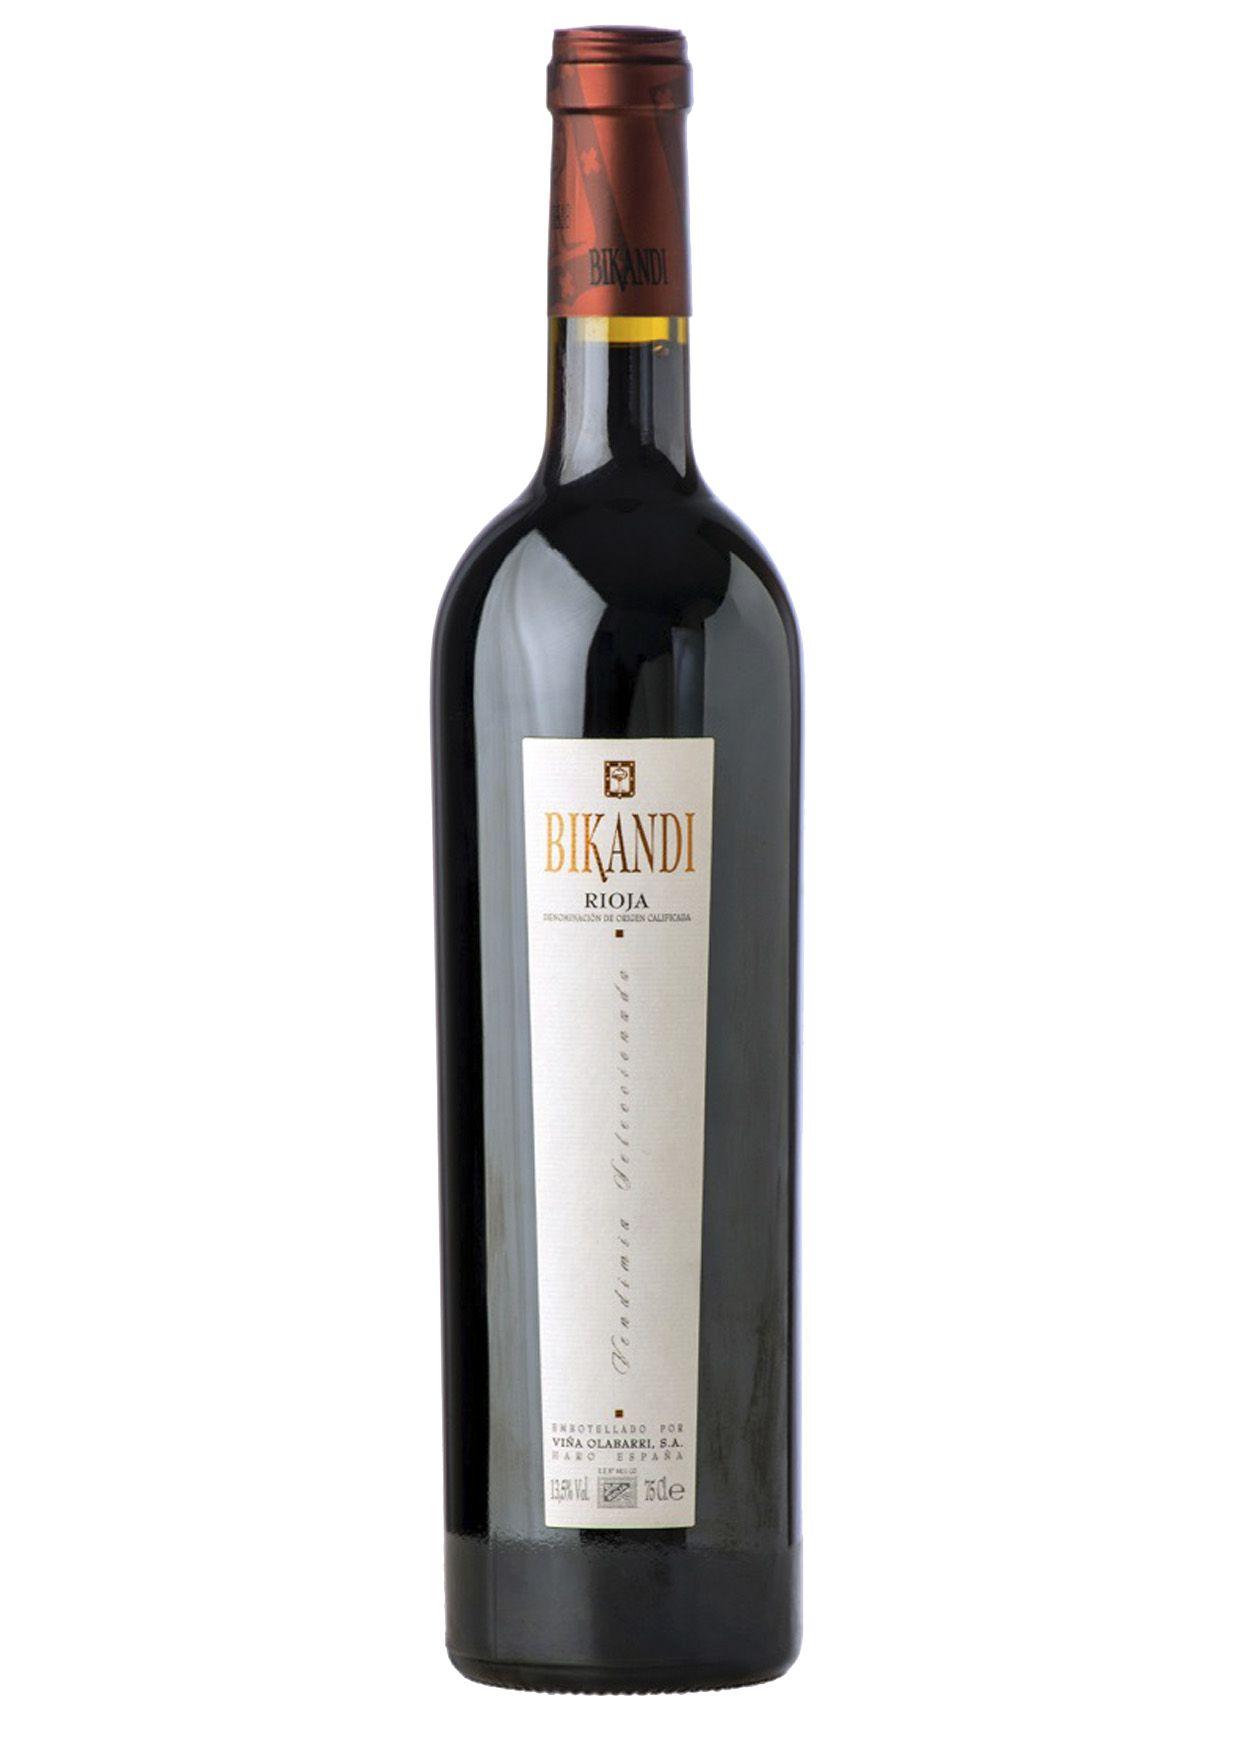 Vinho Vinho Vinã Olabarri Bikandi Rioja 750ml